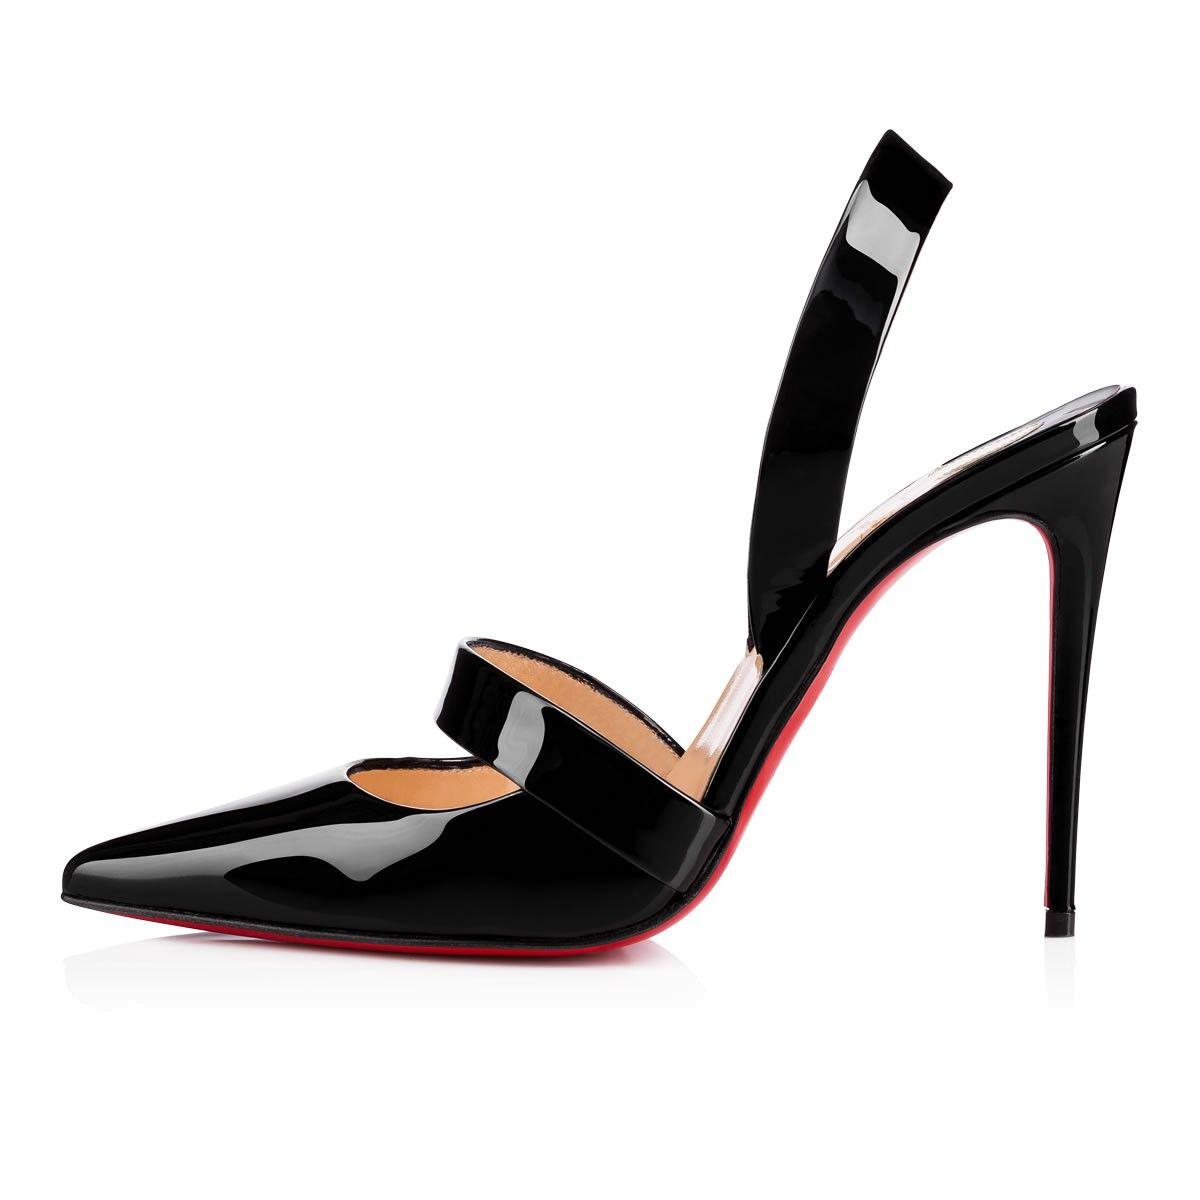 Actina 100 black patent leather pumps Christian Louboutin 4PTb2HOG